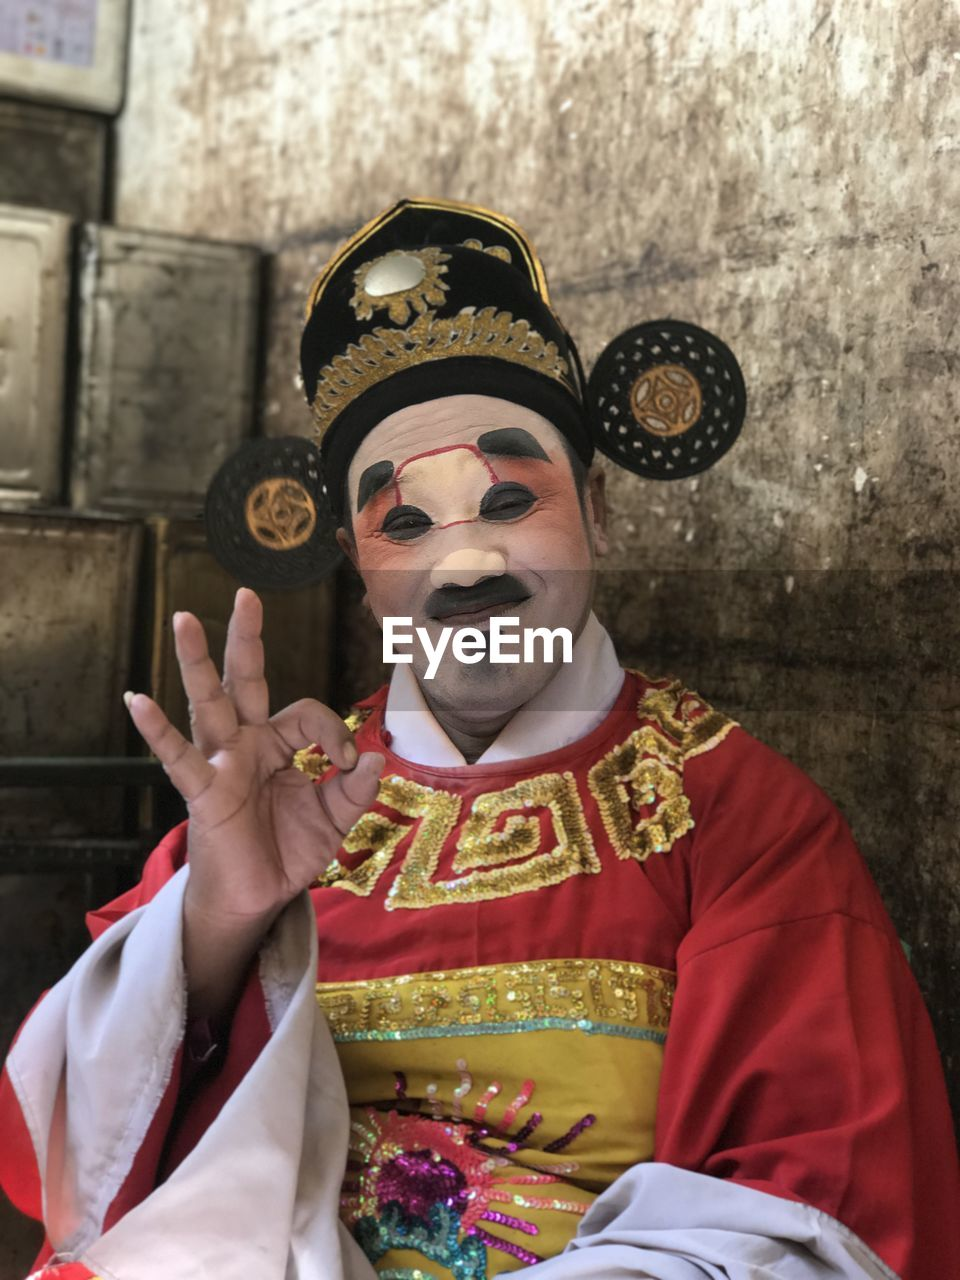 Actor Bangkok Buddhist Buddhist Temple Headwear One  de50f9b1abc